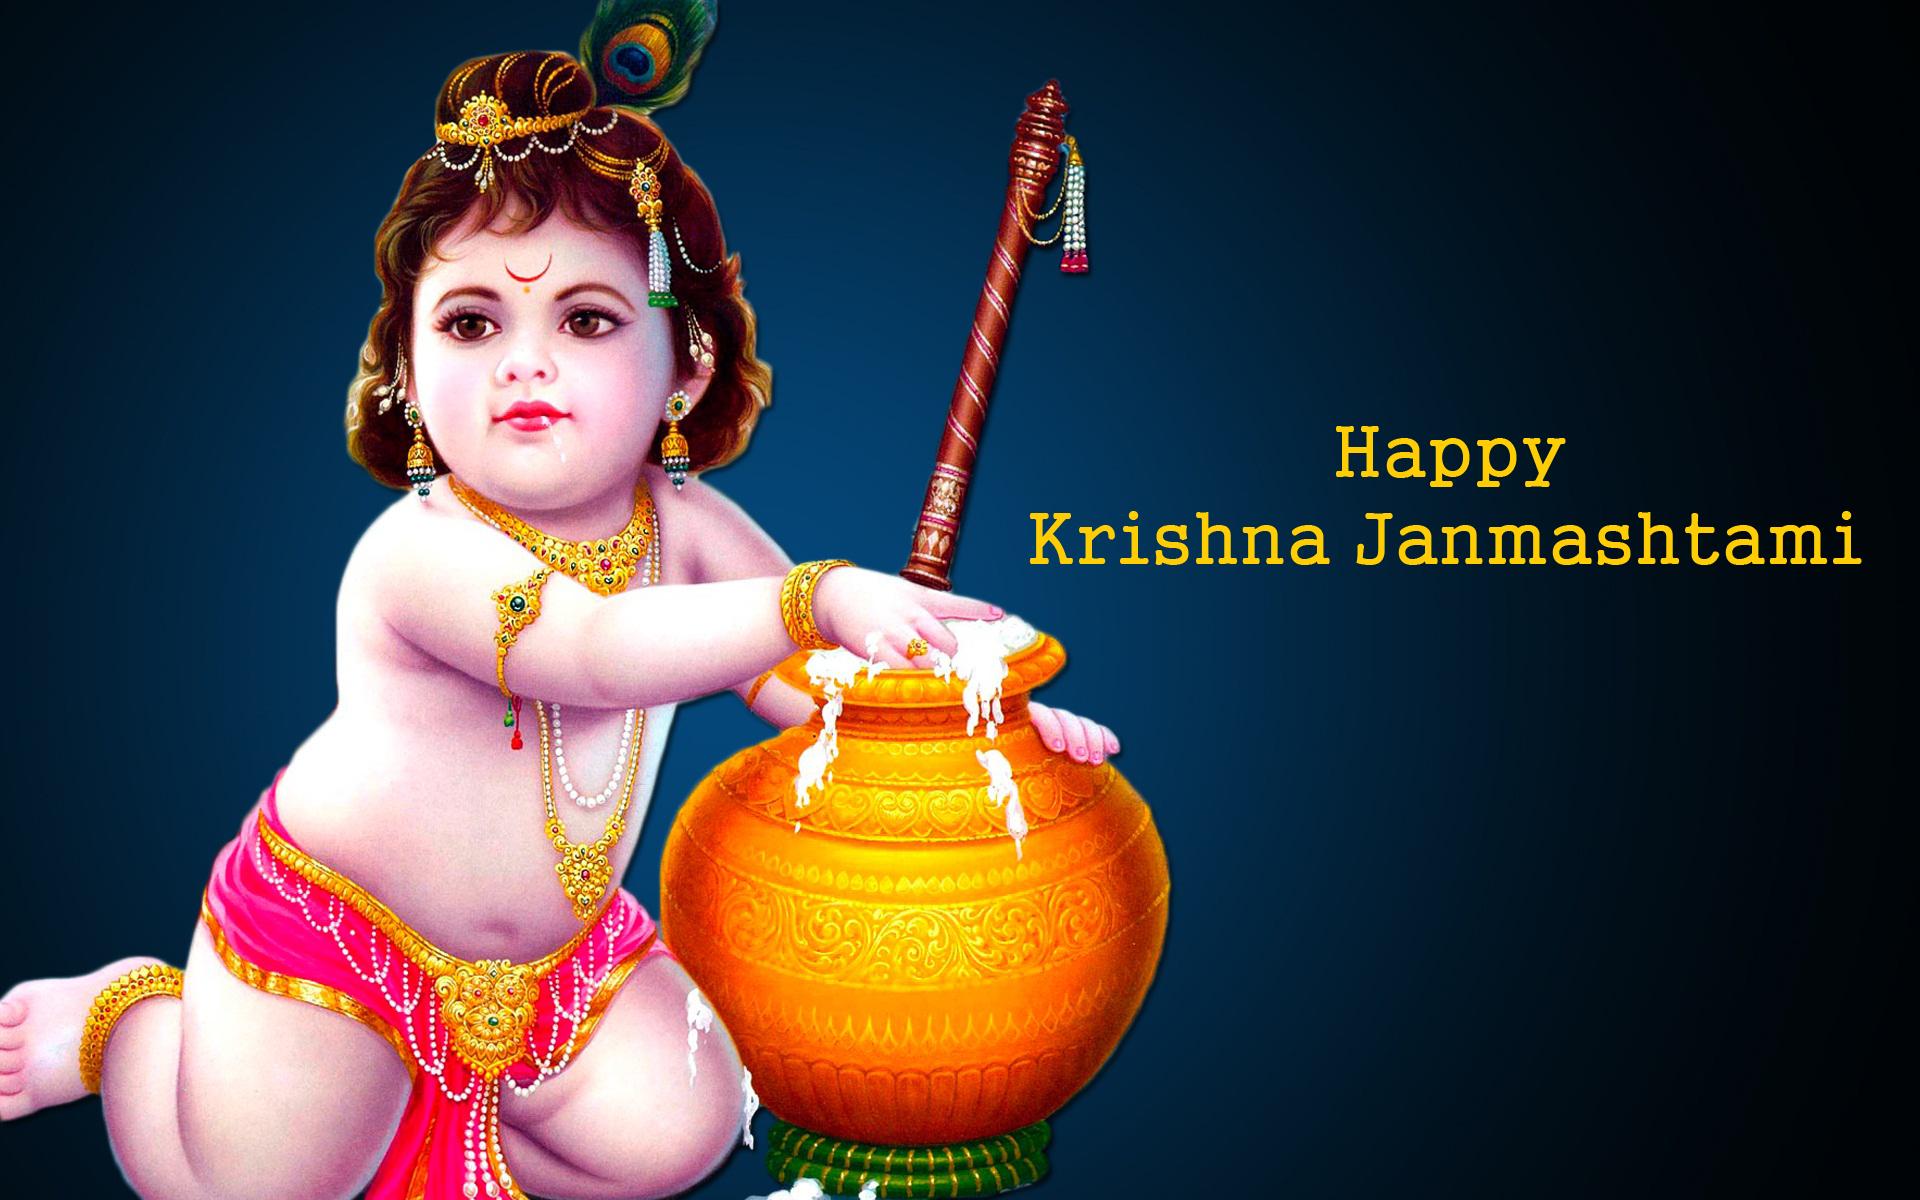 Janamashtami Images Of The Lord Krishna - Happy Krishna Janmashtami 2017 - HD Wallpaper